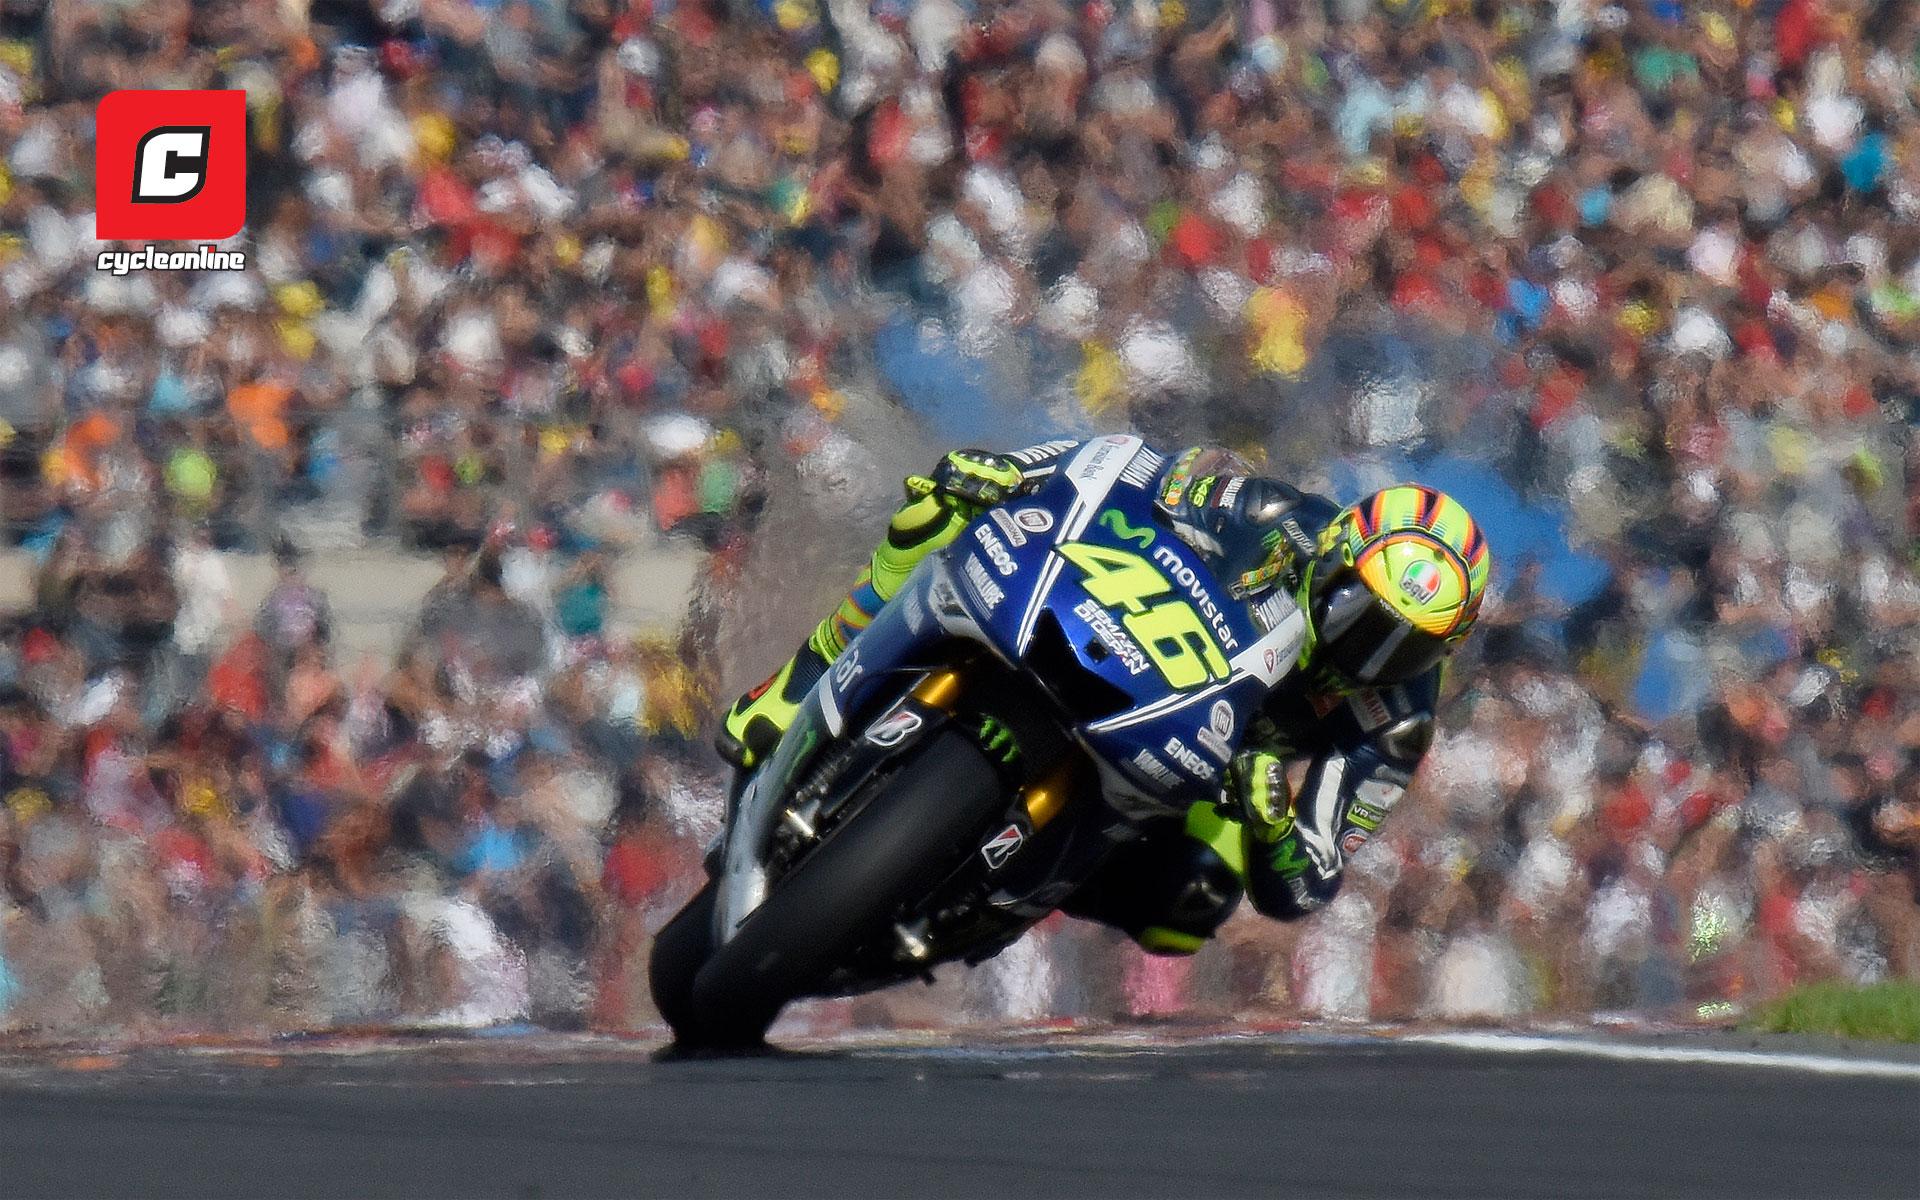 Wednesday Wallpaper: Valentino Rossi - CycleOnline.com.au